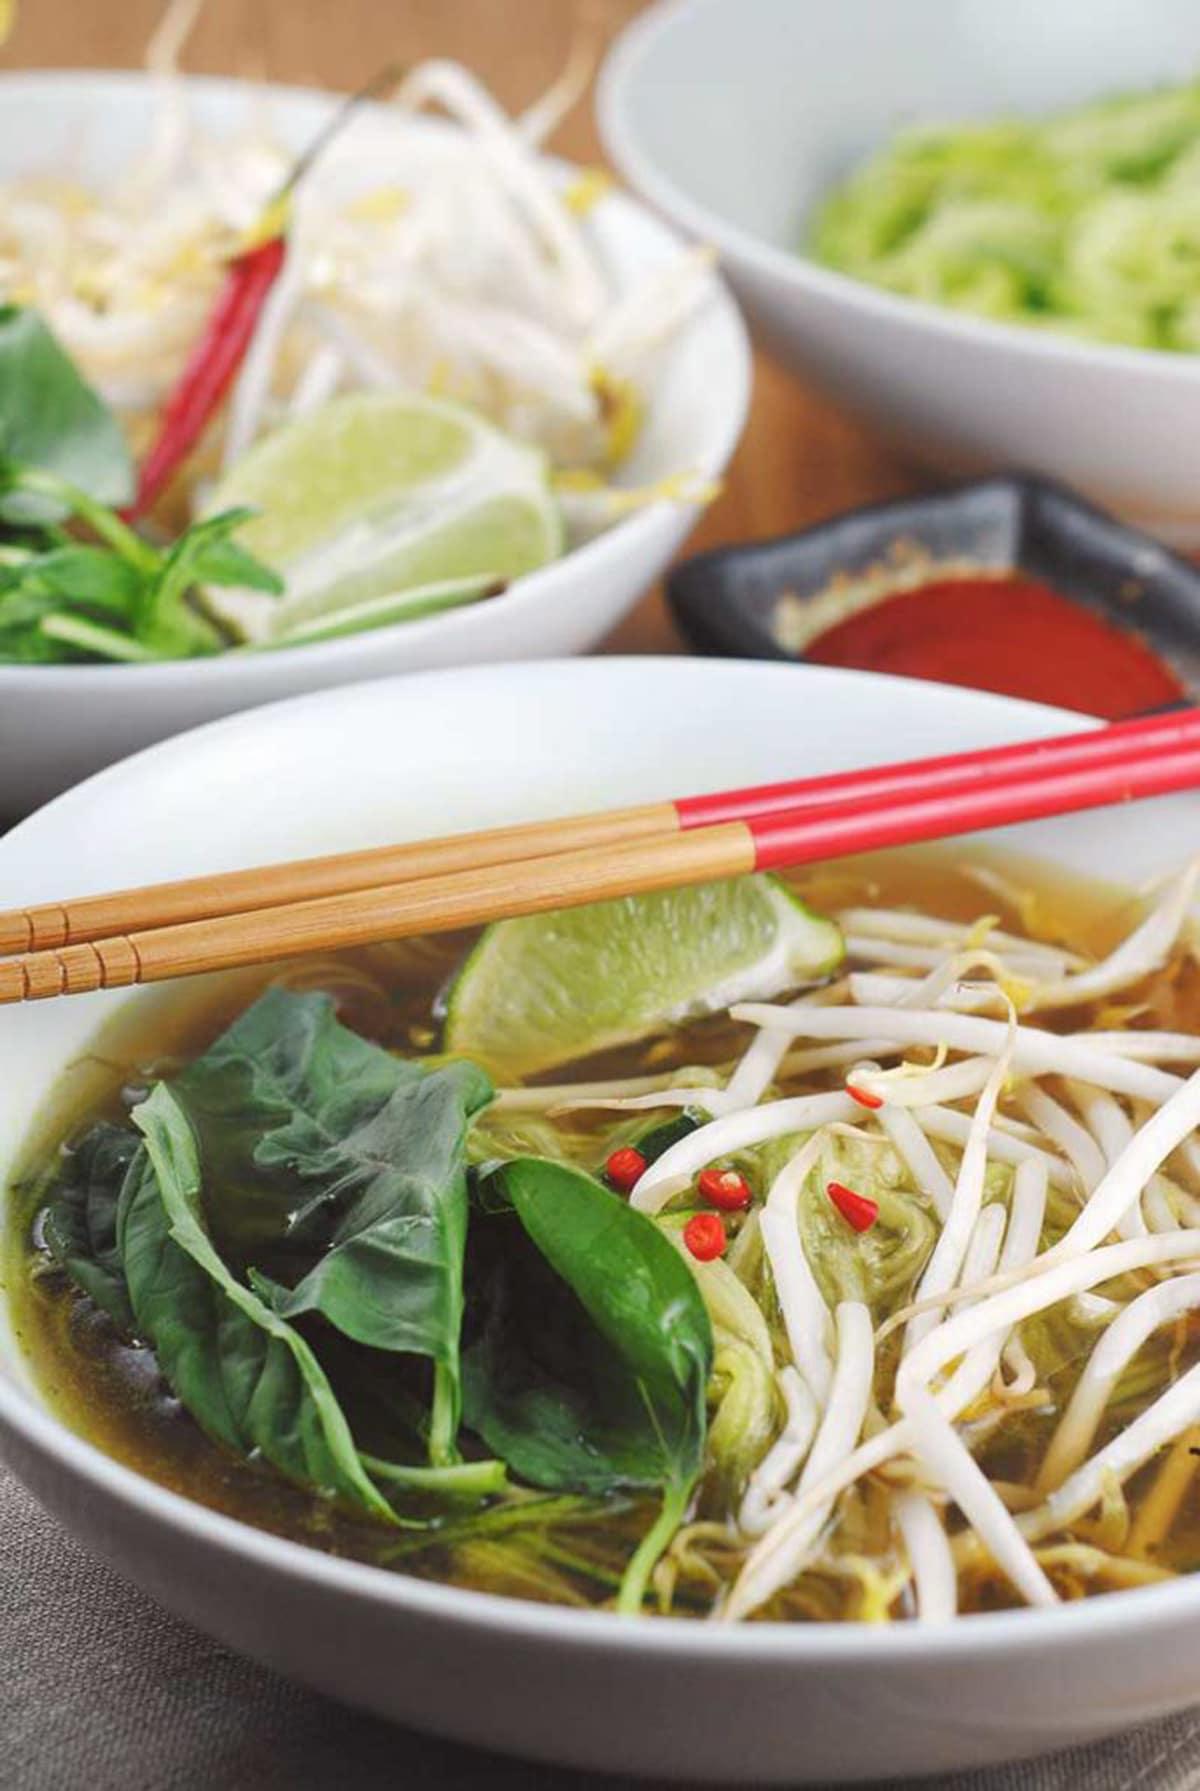 A bowl of zucchini noodle soup with chopsticks.